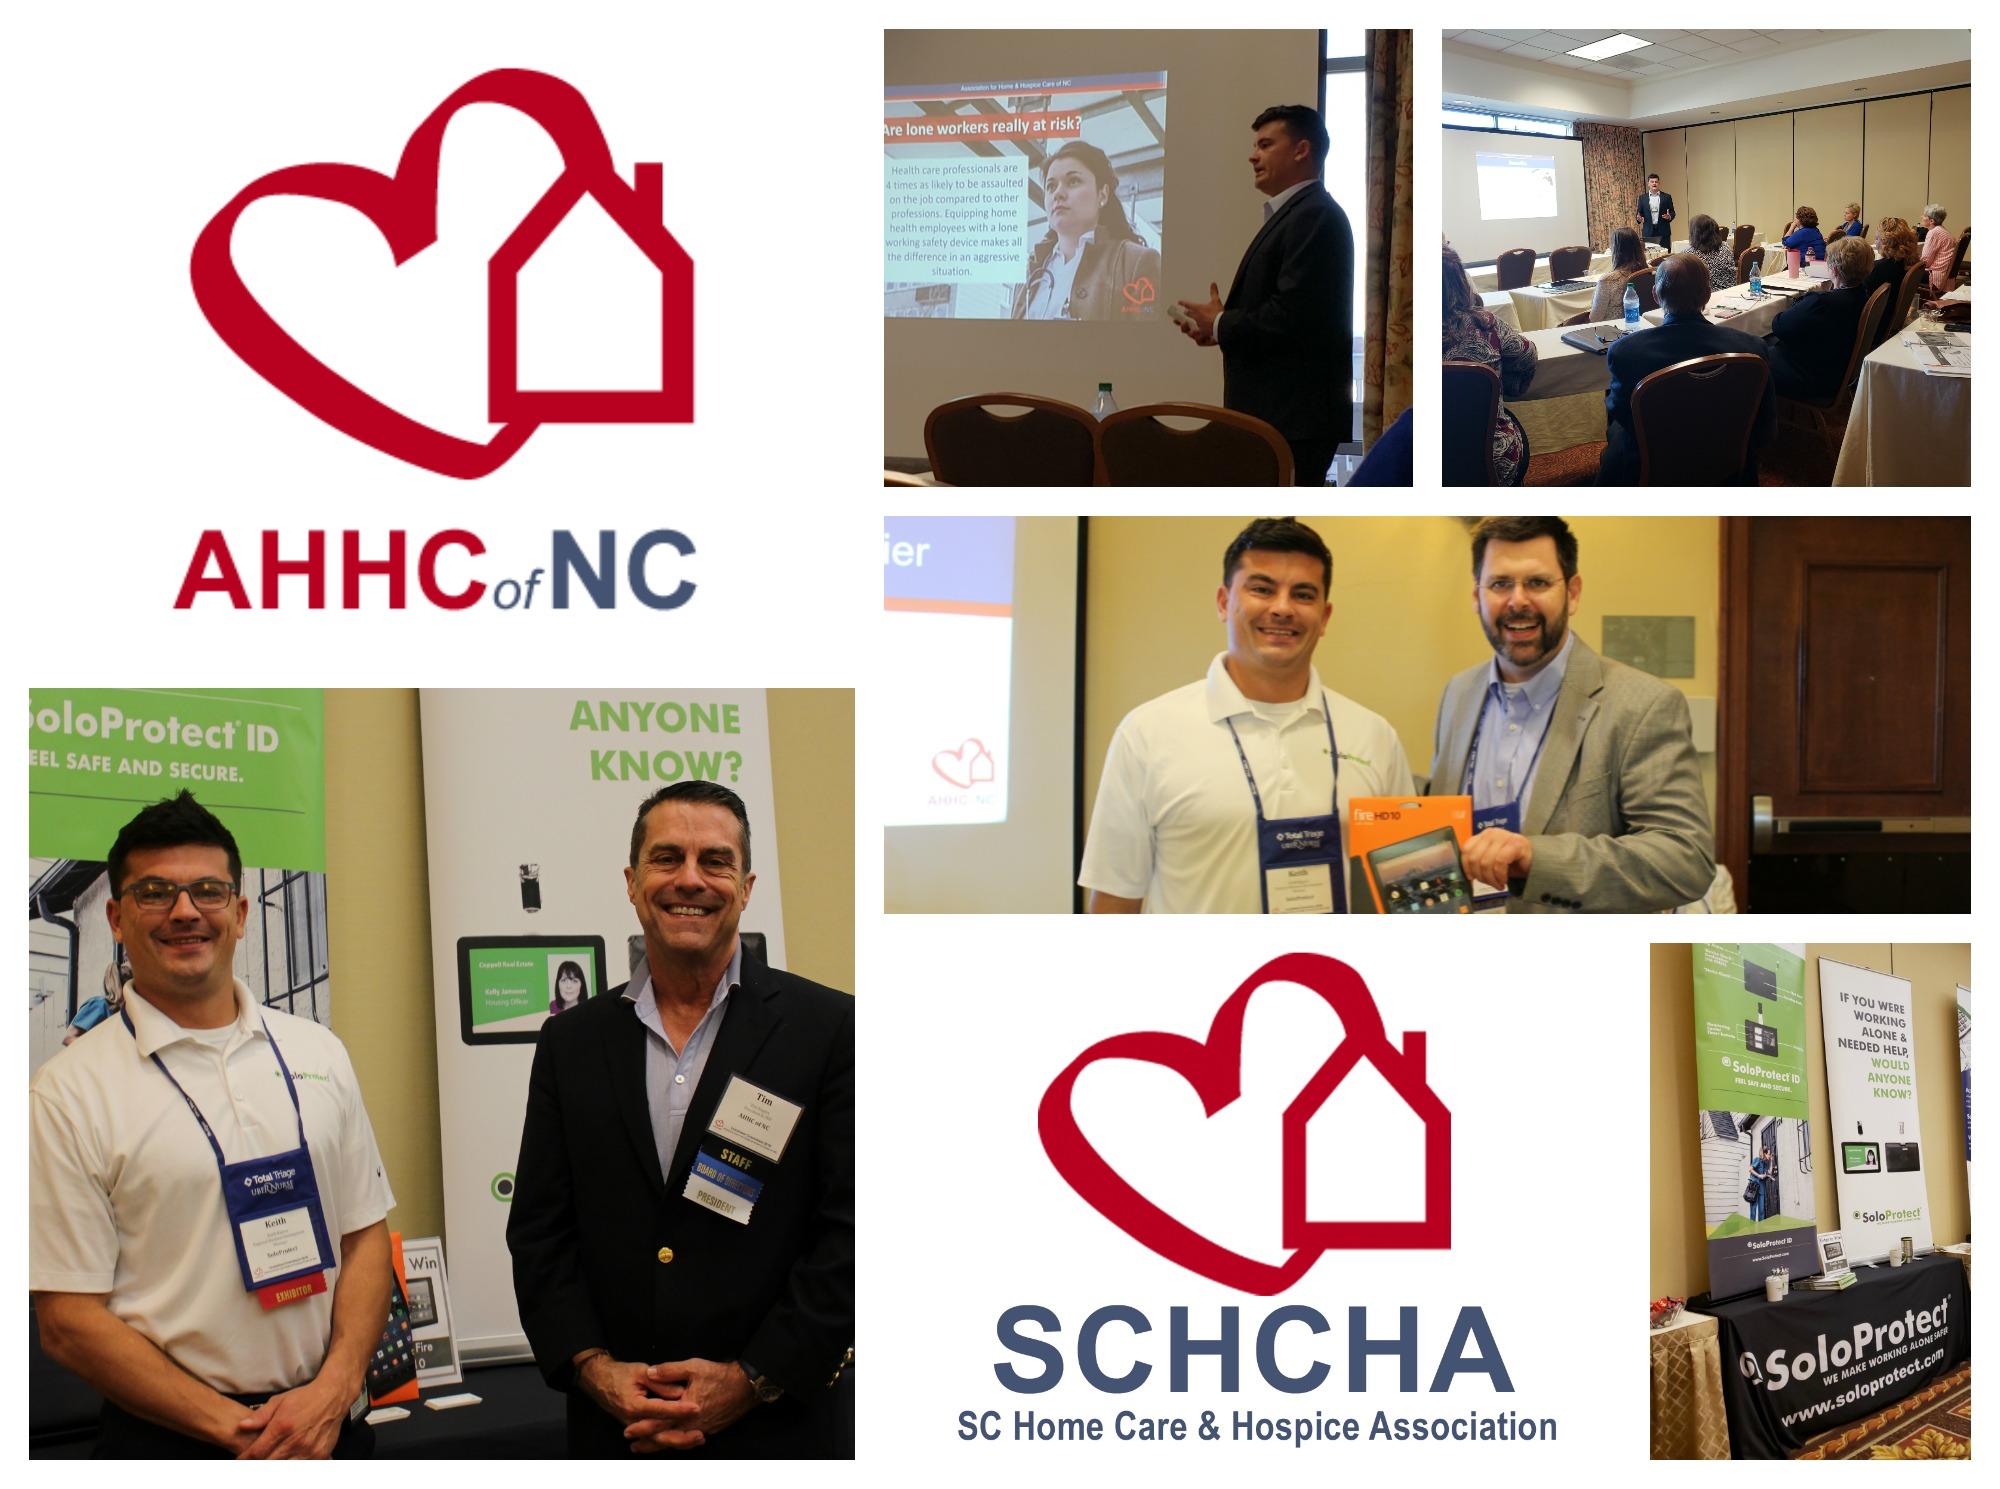 AHHC & SCHCHA